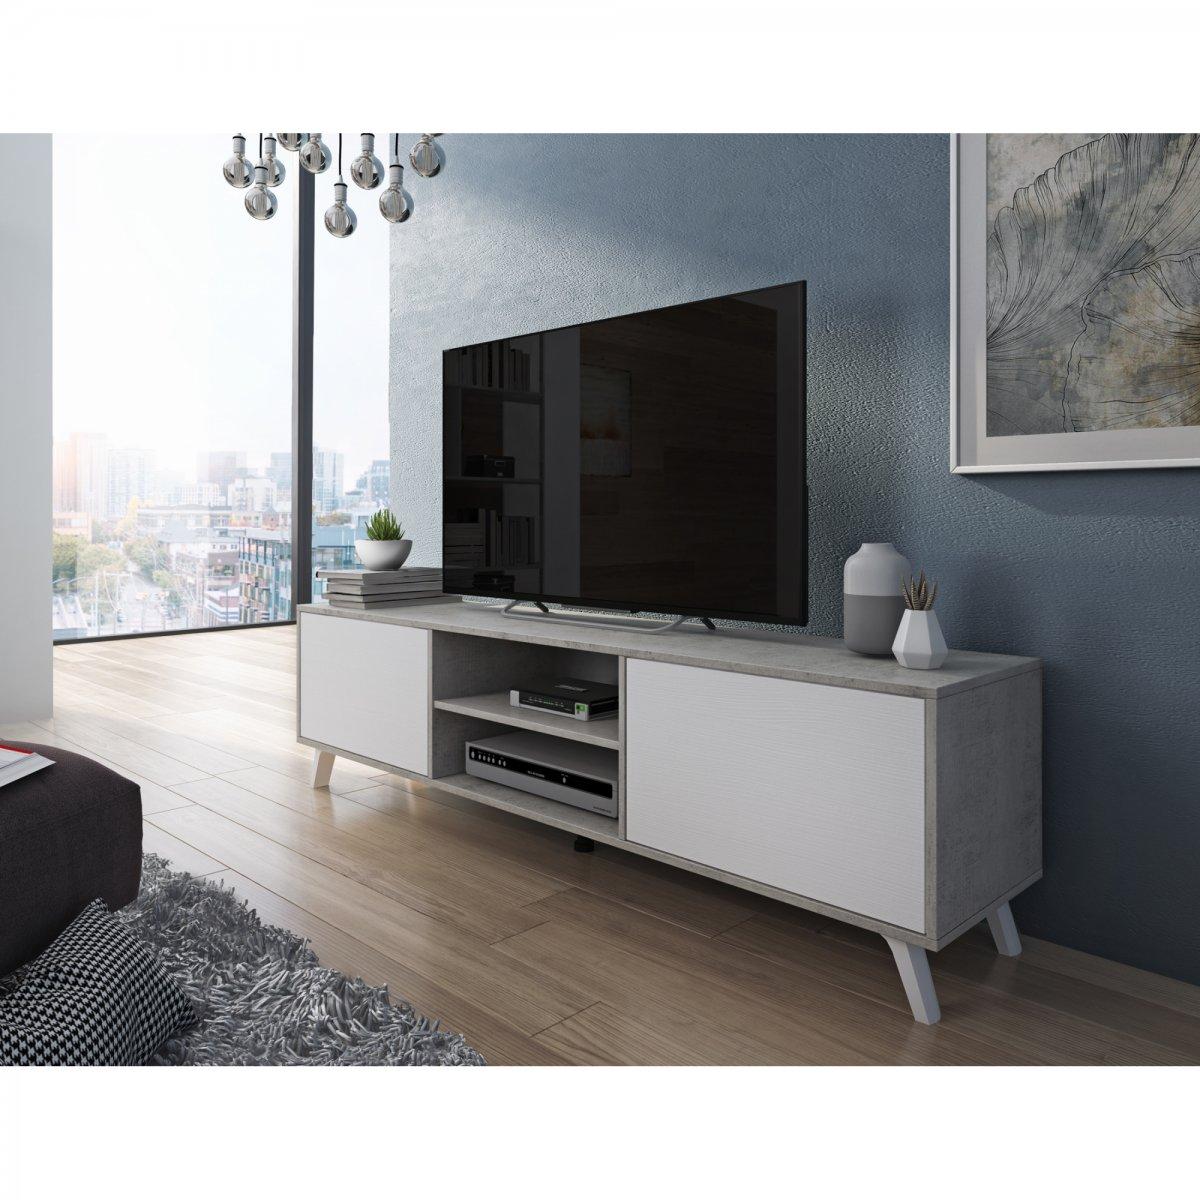 Tomasucci porta TV SMART